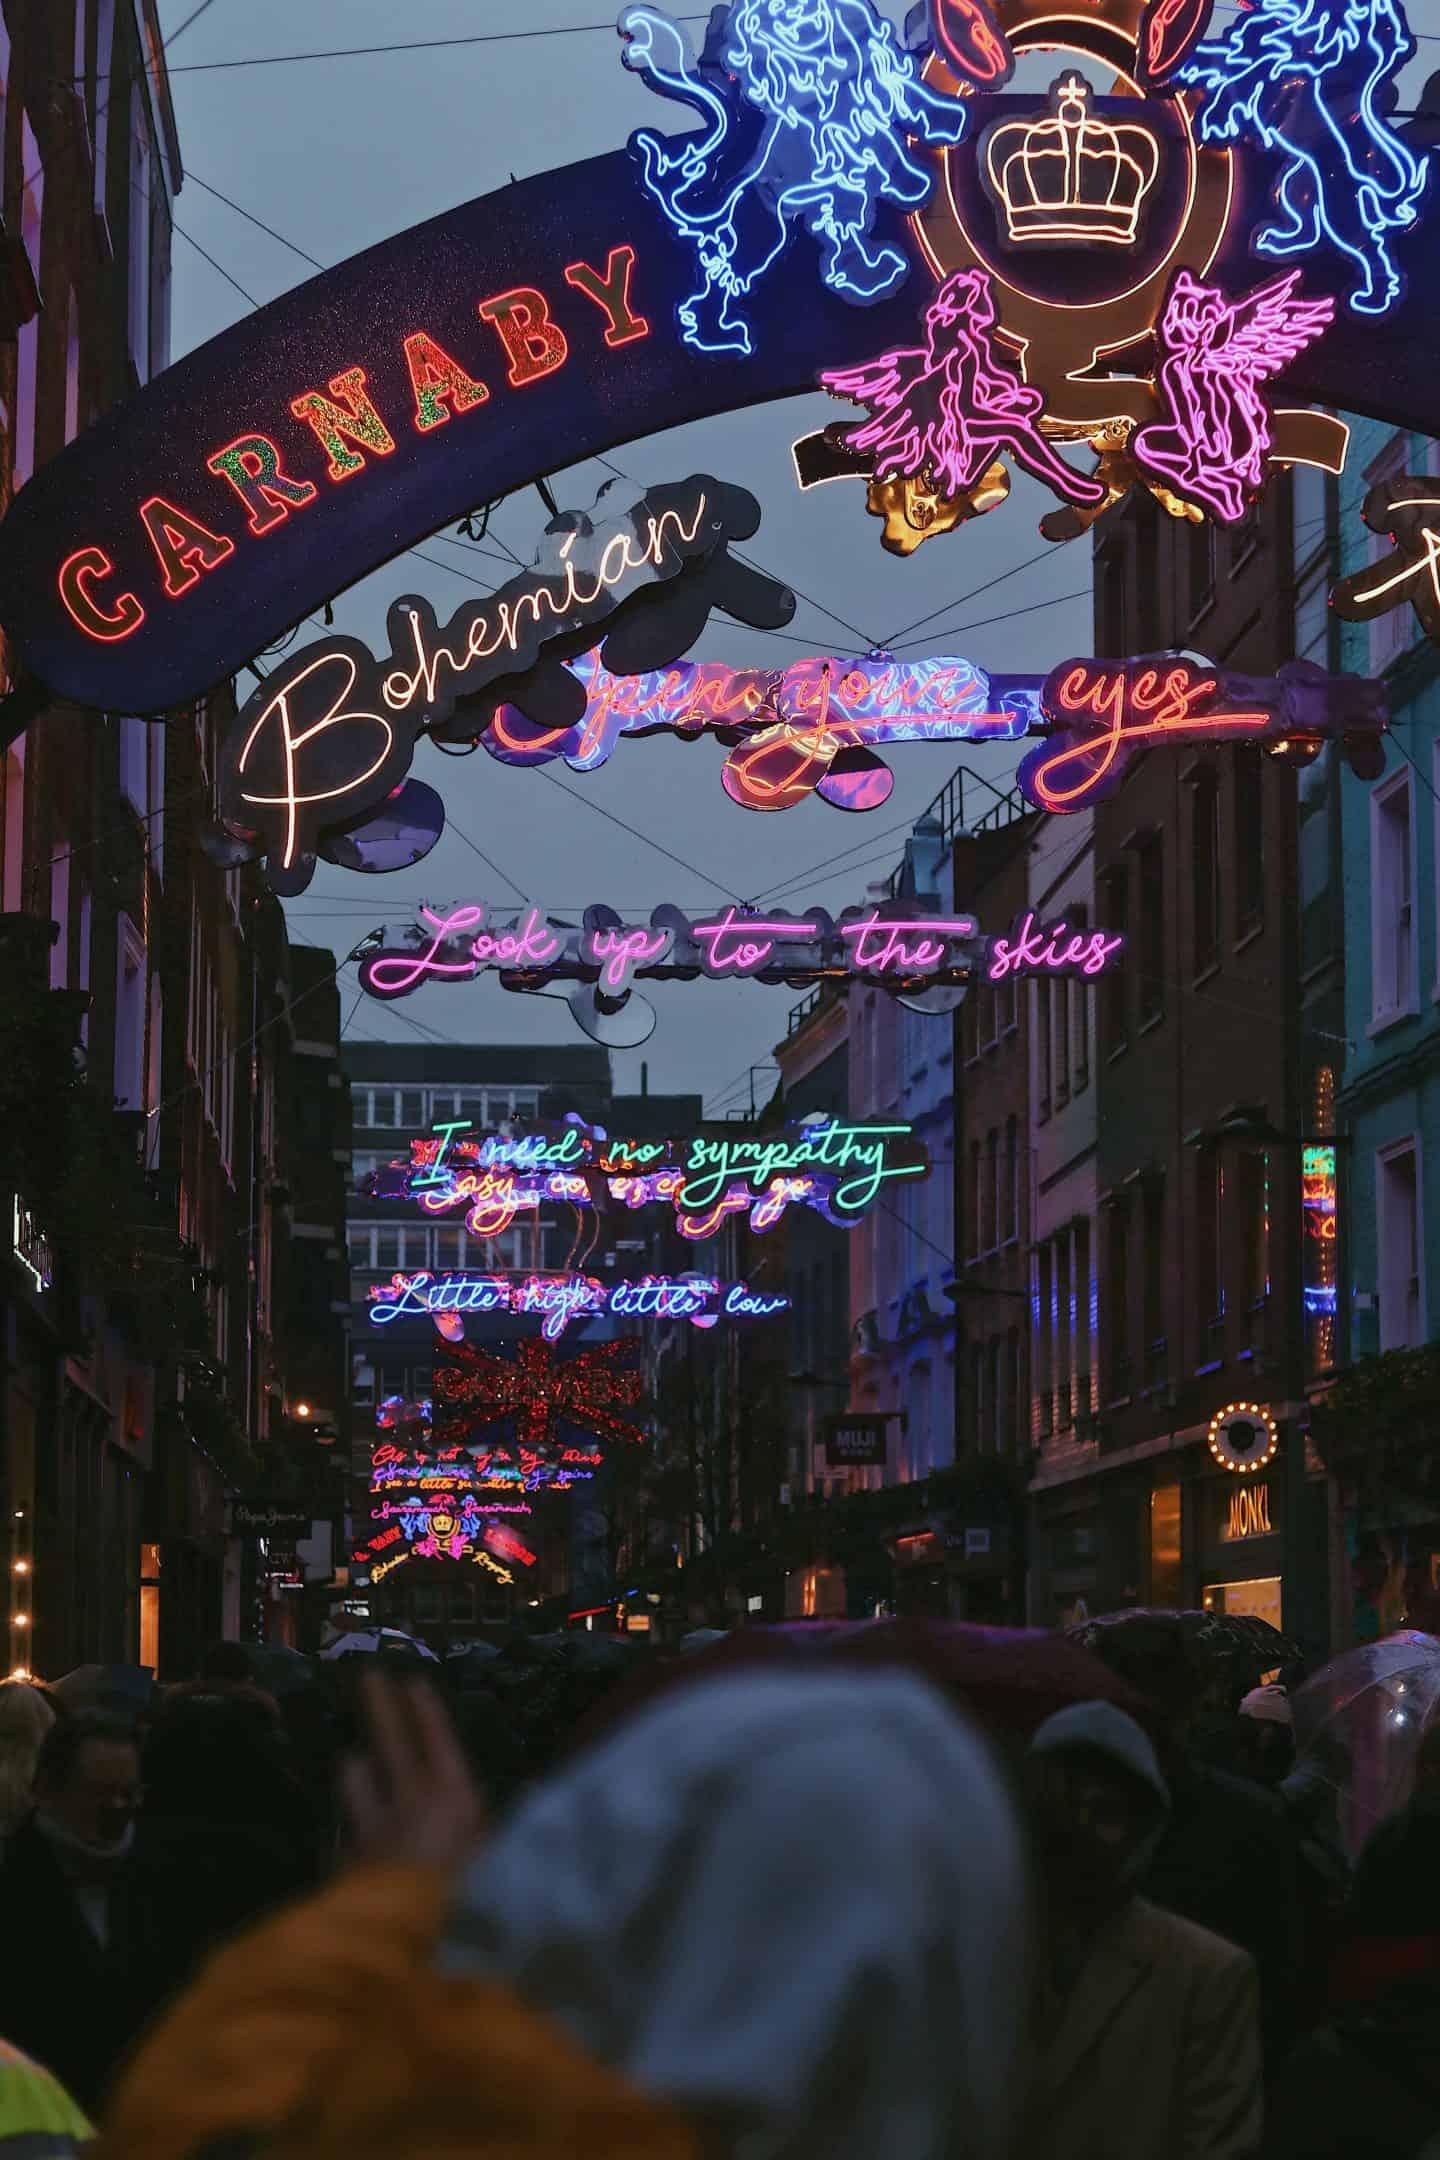 carnaby-street-london-famous-streets-in-london